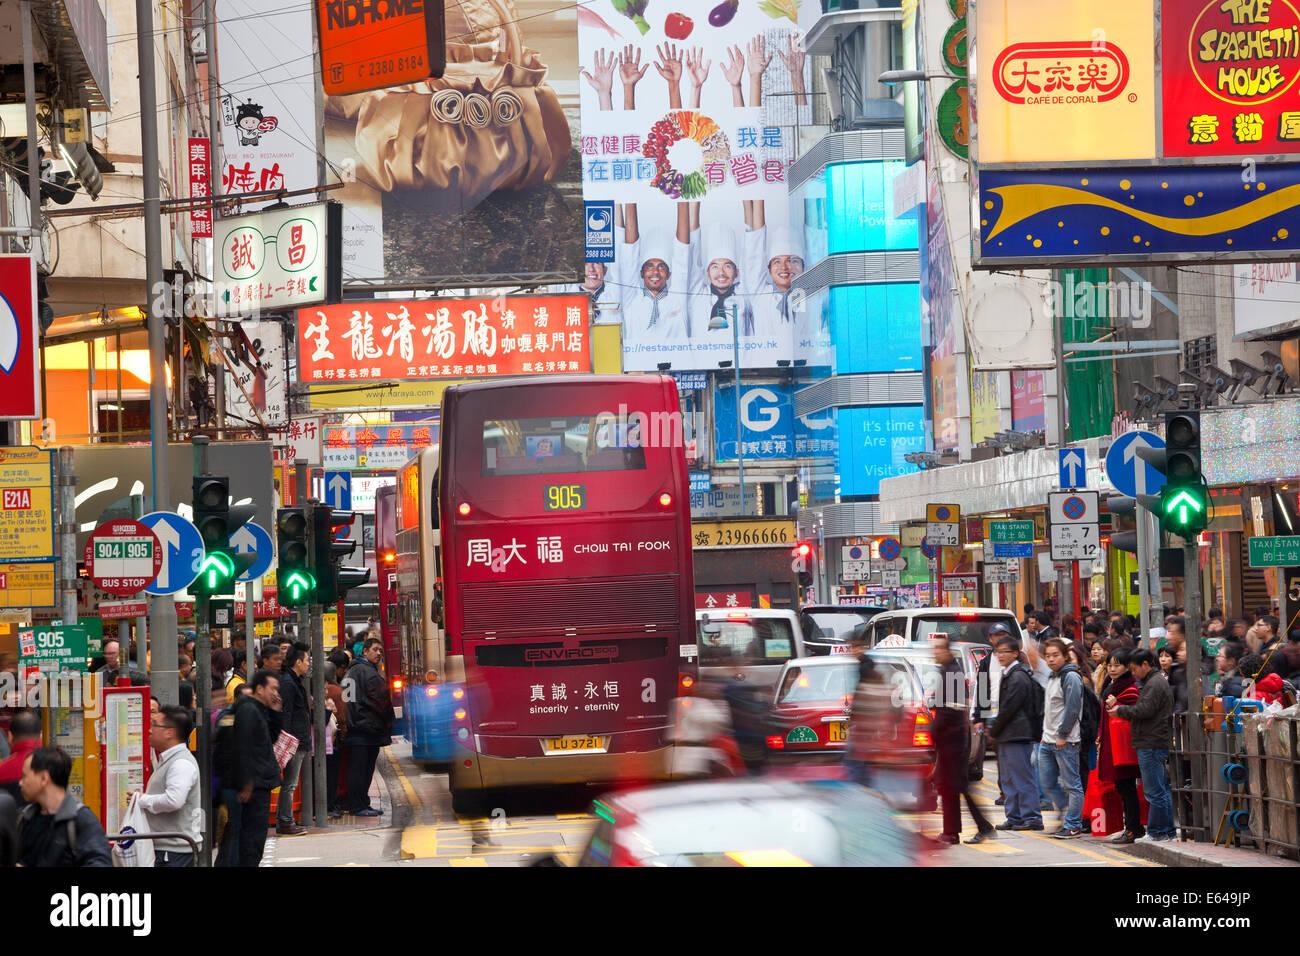 Area commerciale e trafficata strada attraversando nr Fa Yuen St Mercato, Hong Kong, Cina Immagini Stock